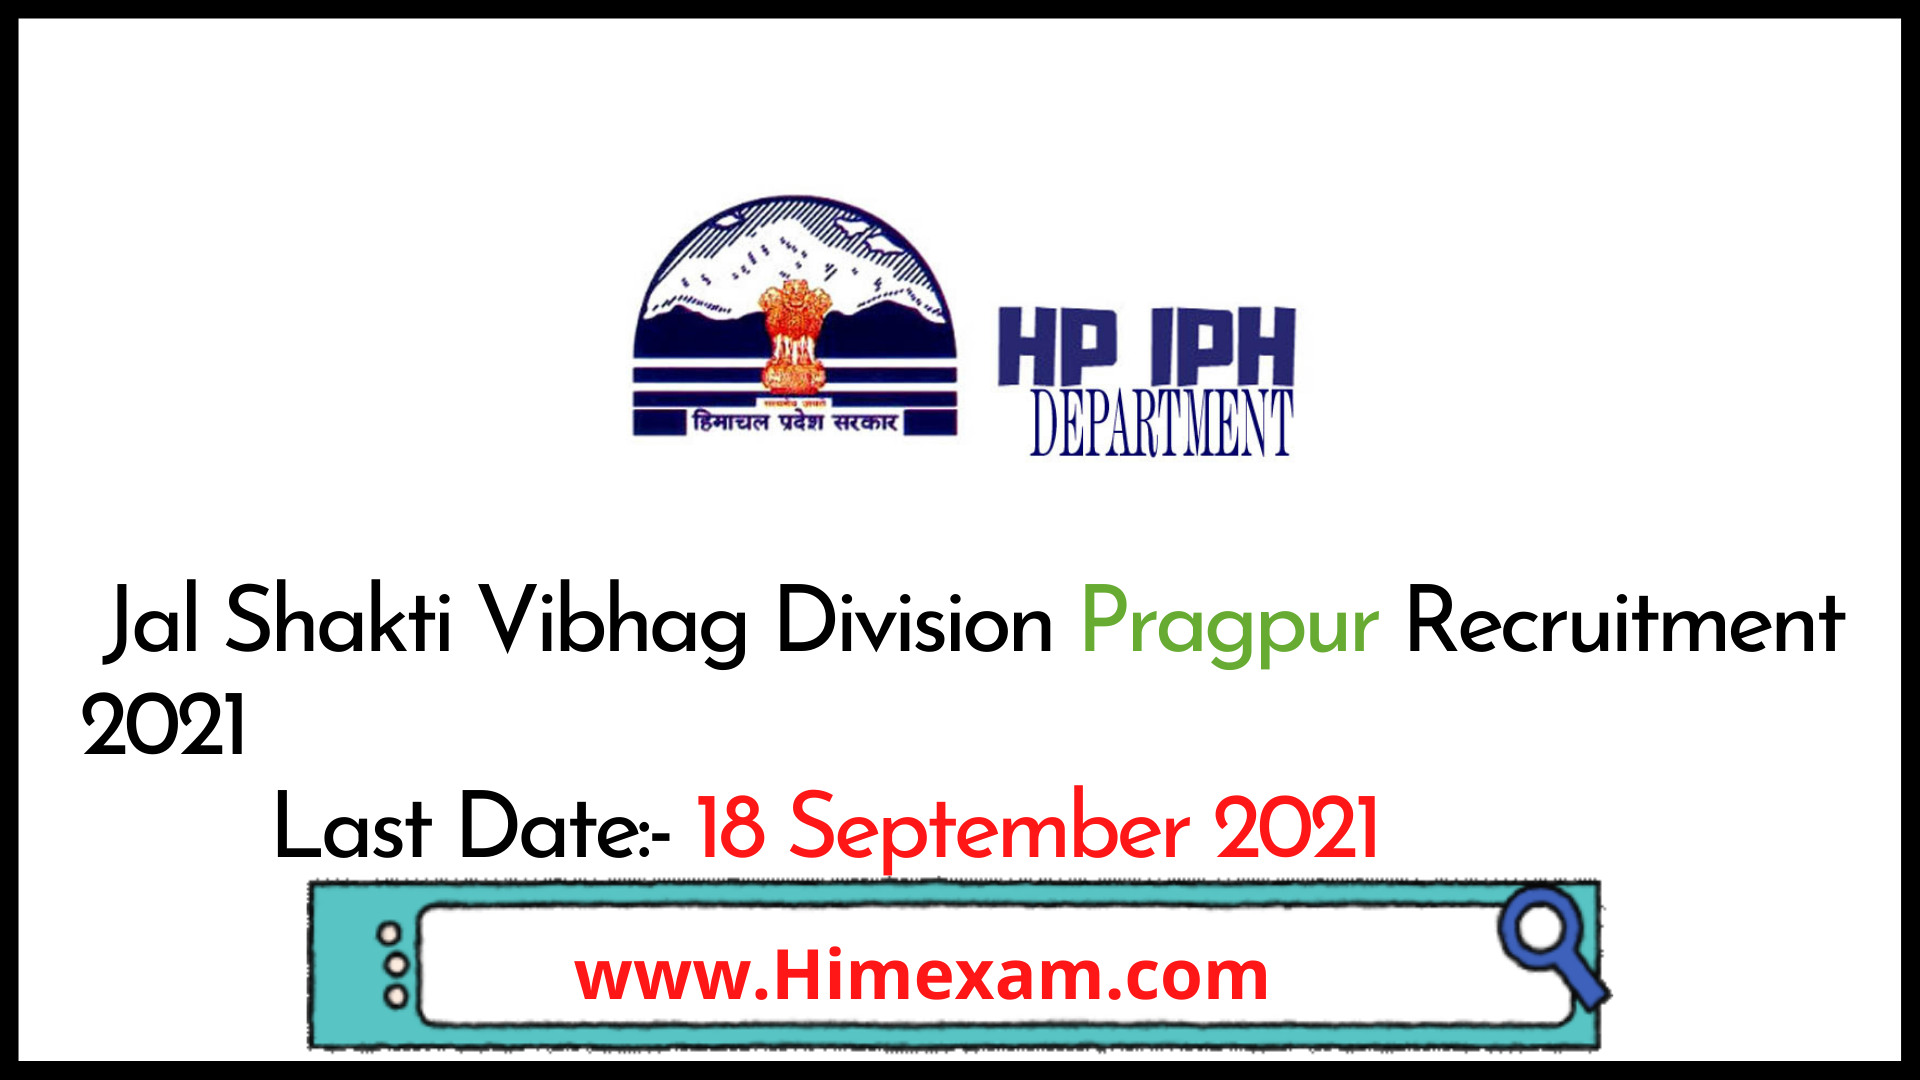 Jal Shakti Vibhag Division Pragpur Recruitment 2021